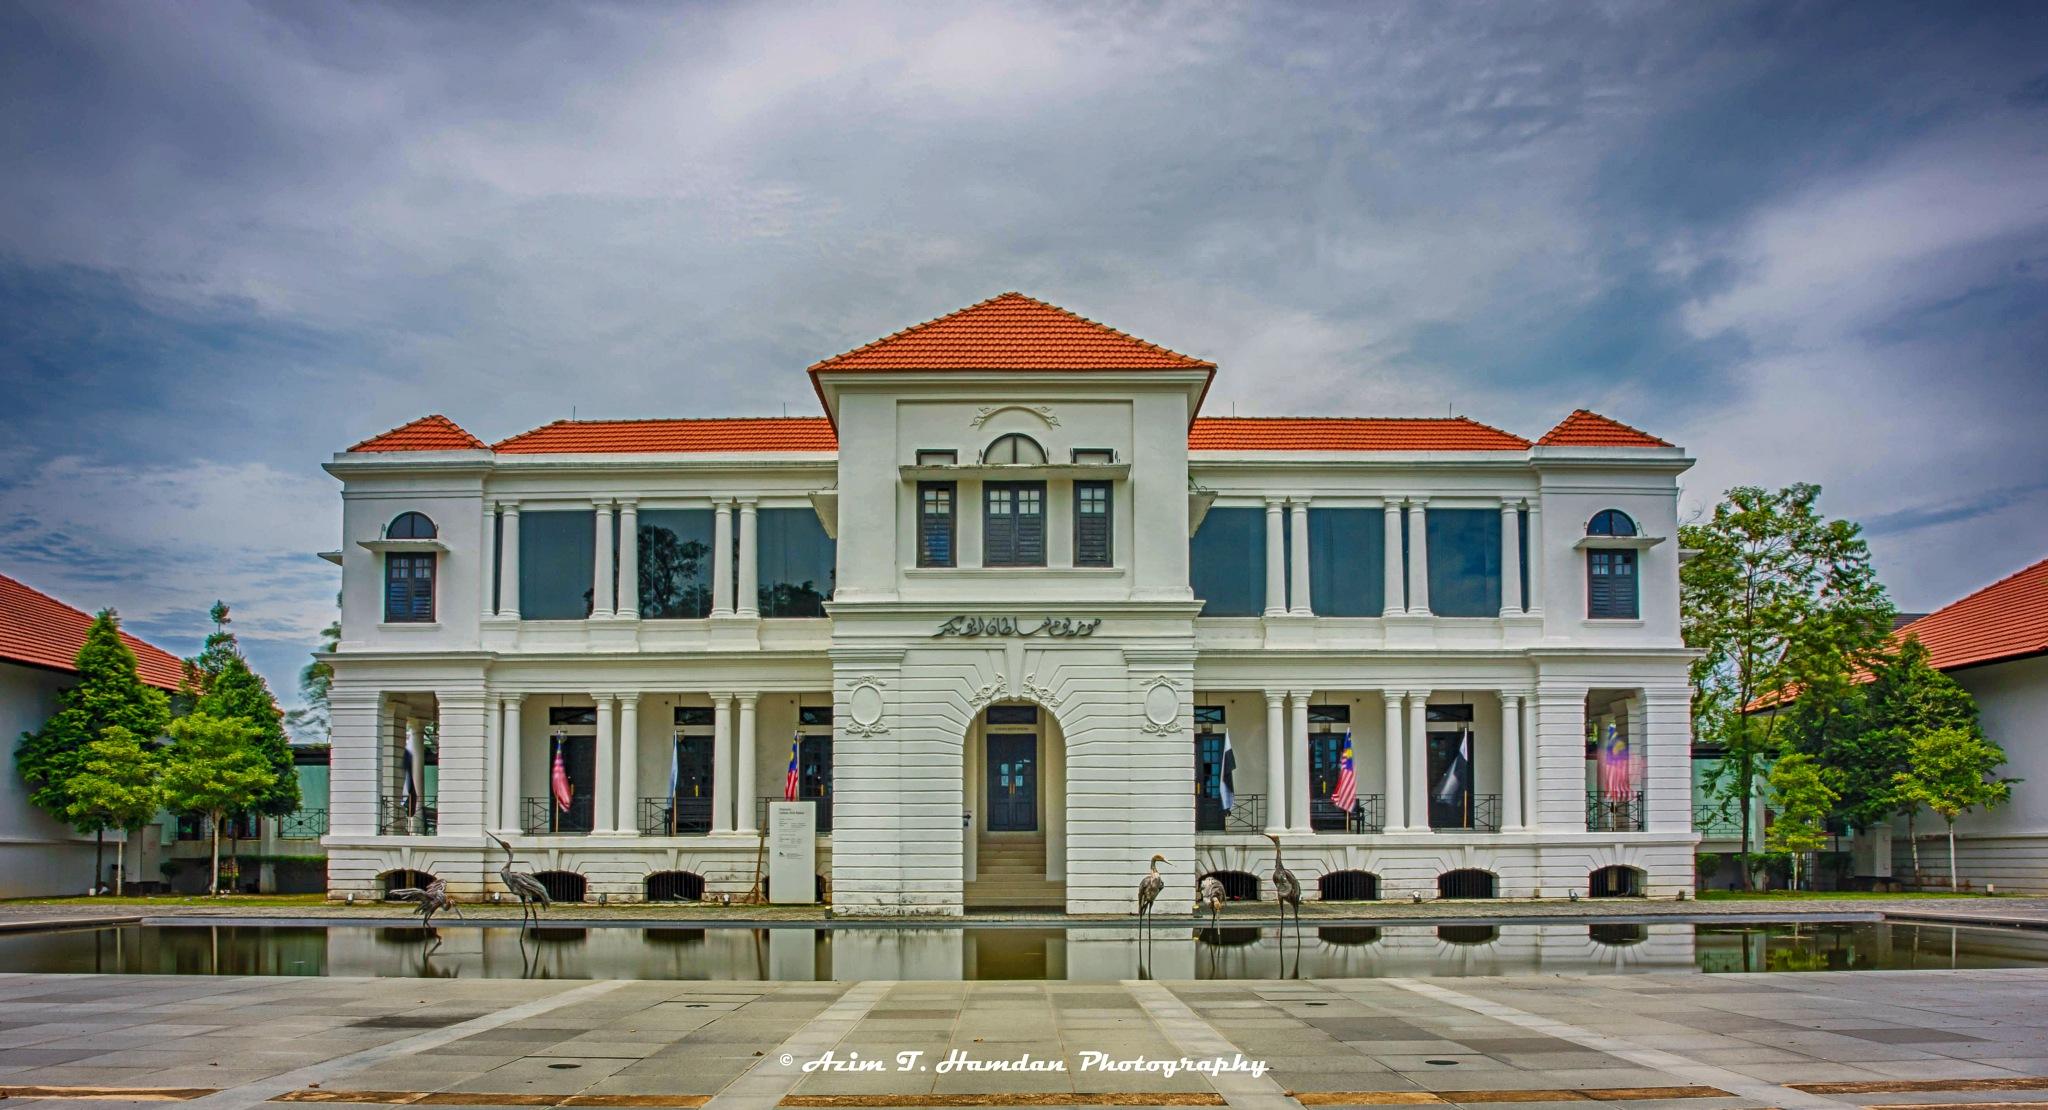 The Sultan Abu Bakar Museum by Azim Taufik Hamdan